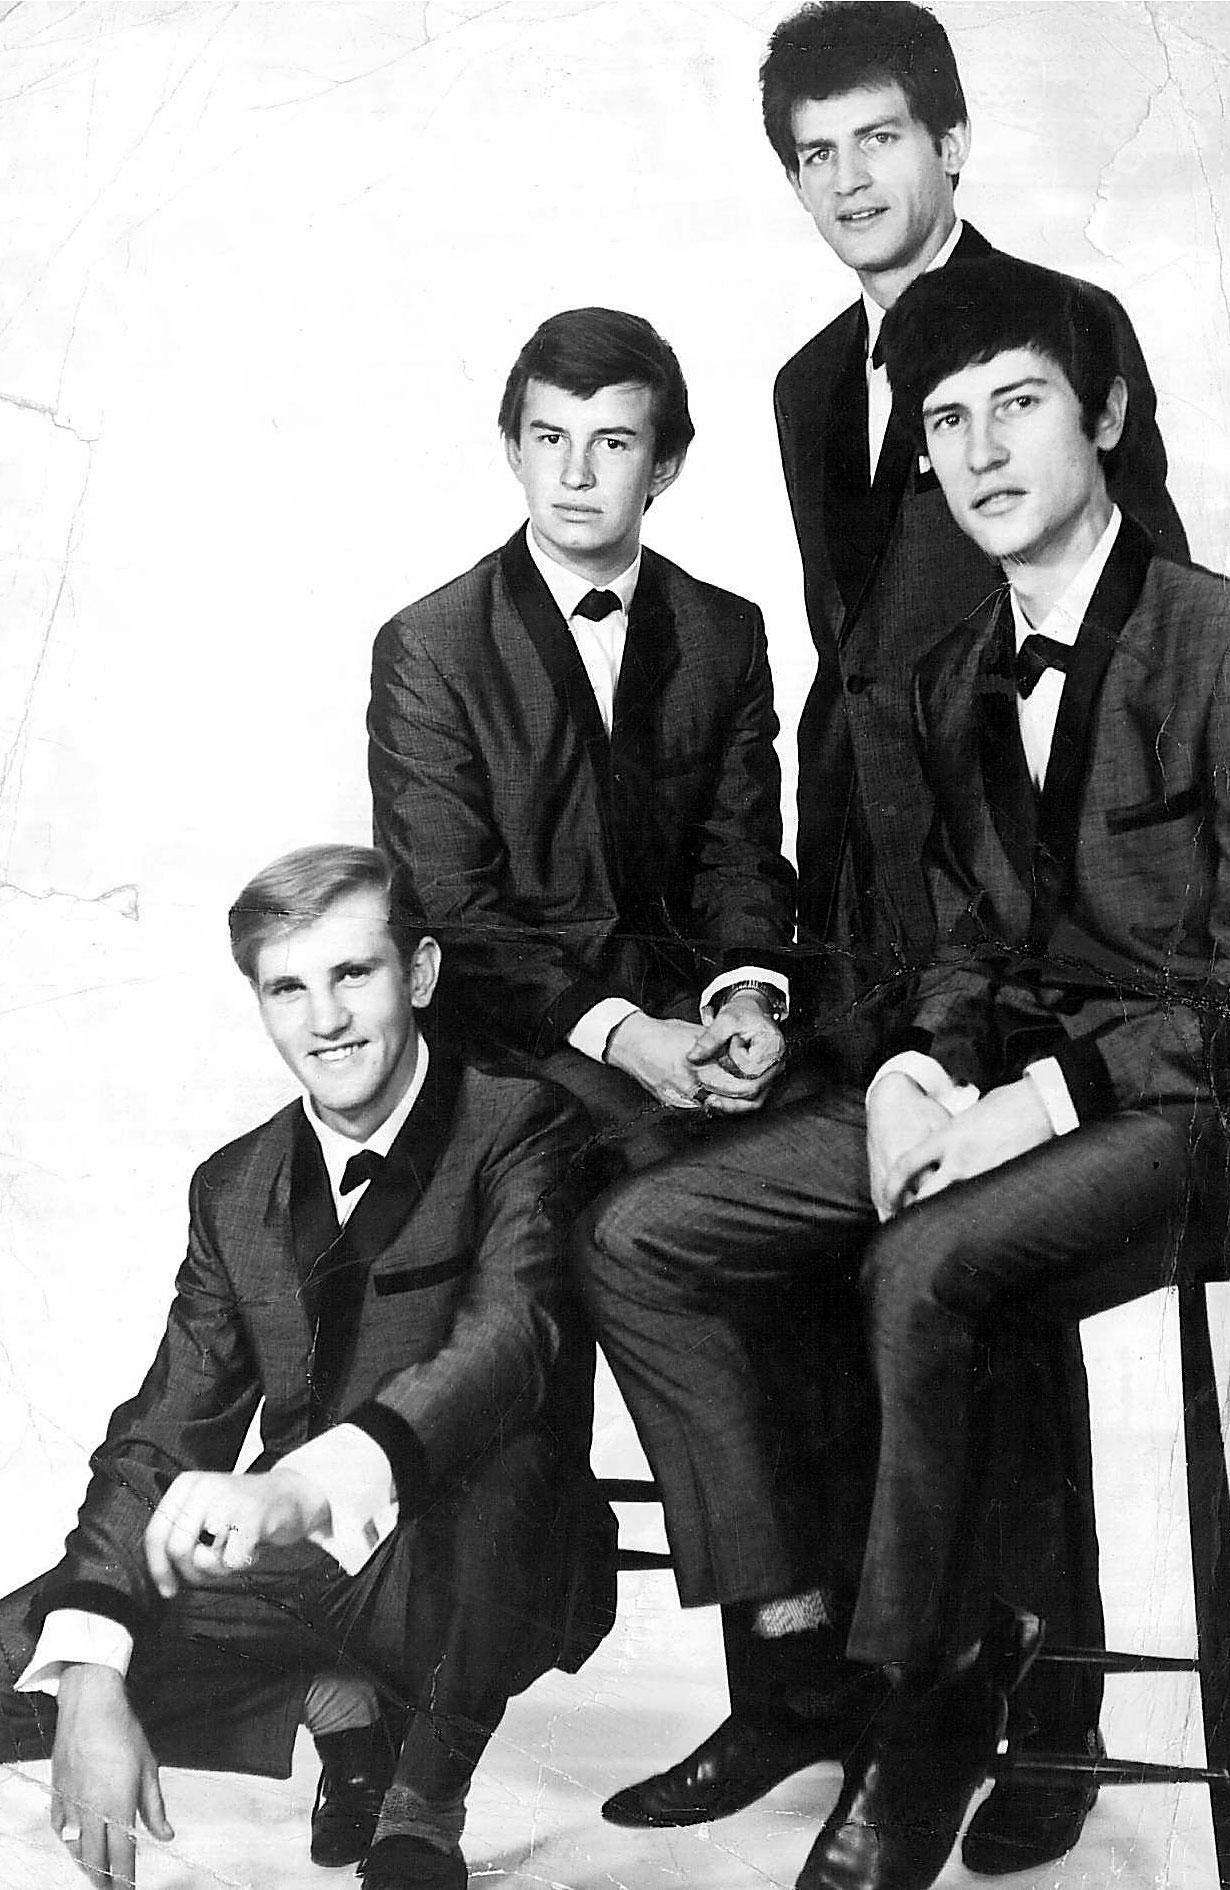 The falling leaves 1965 leib brews george mccauley on chair hank